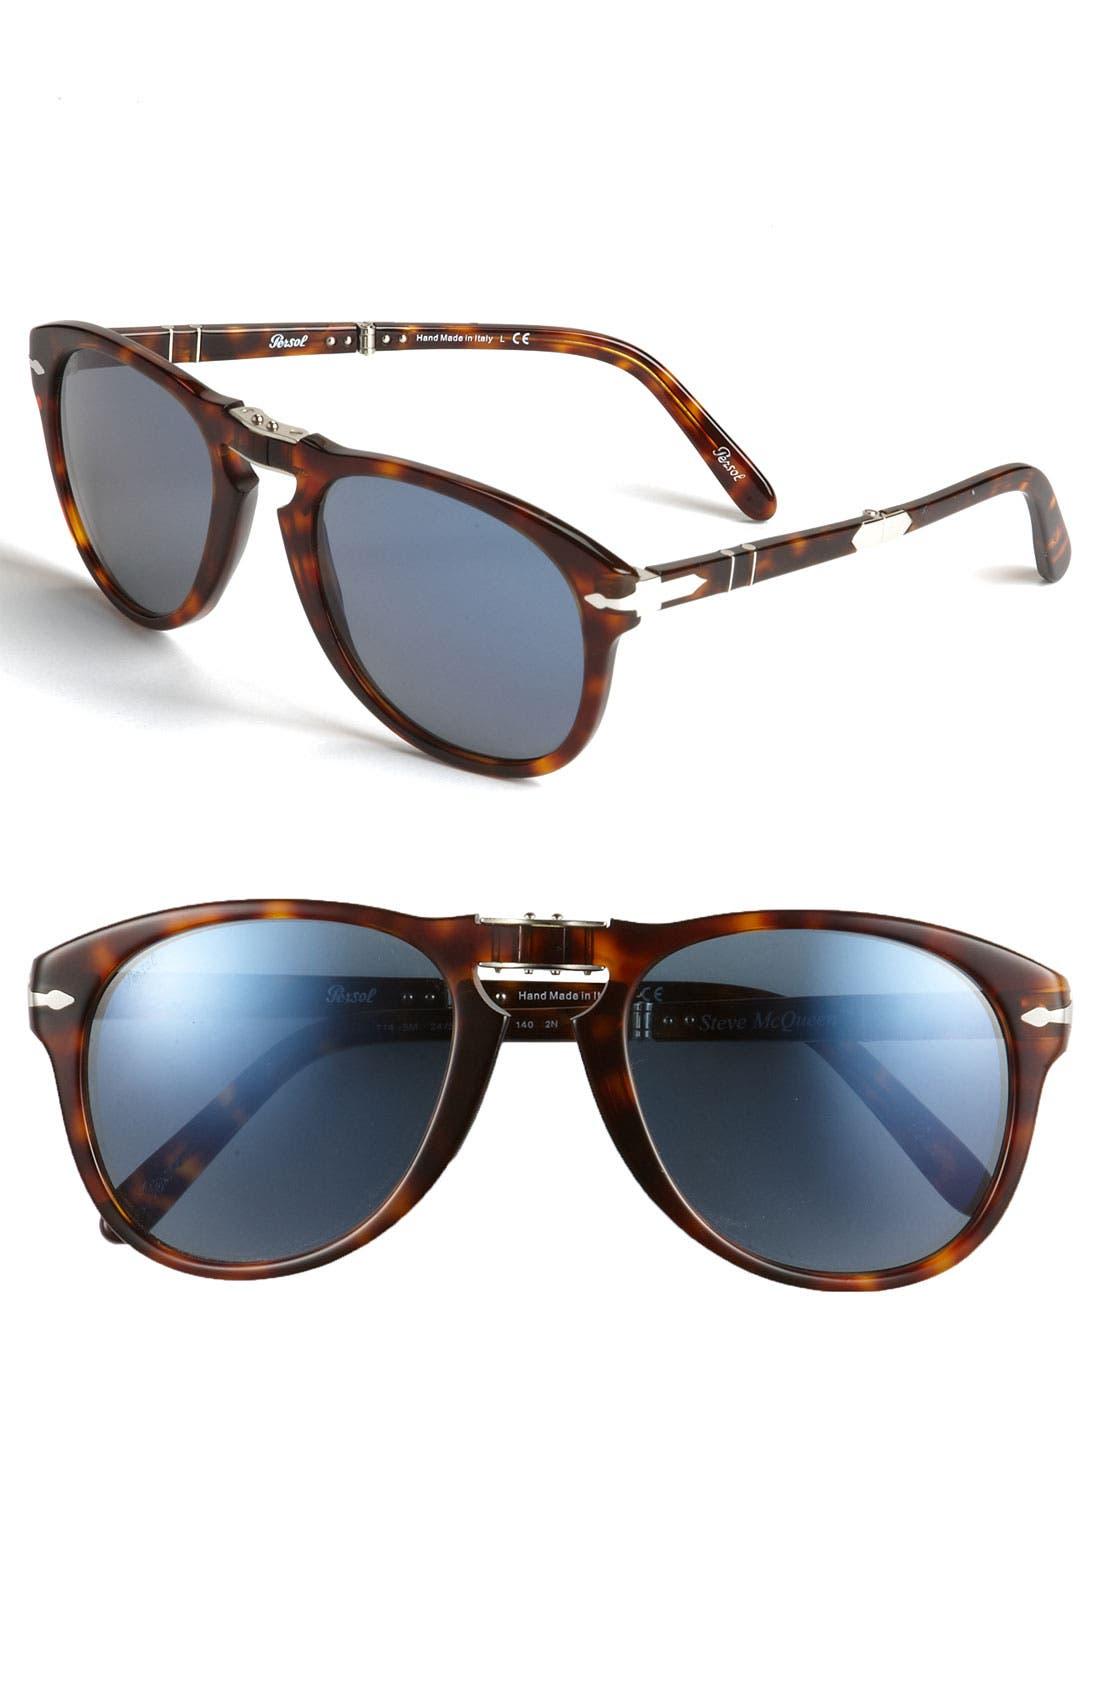 Main Image - Persol 'Steve McQueen™' Folding Sunglasses